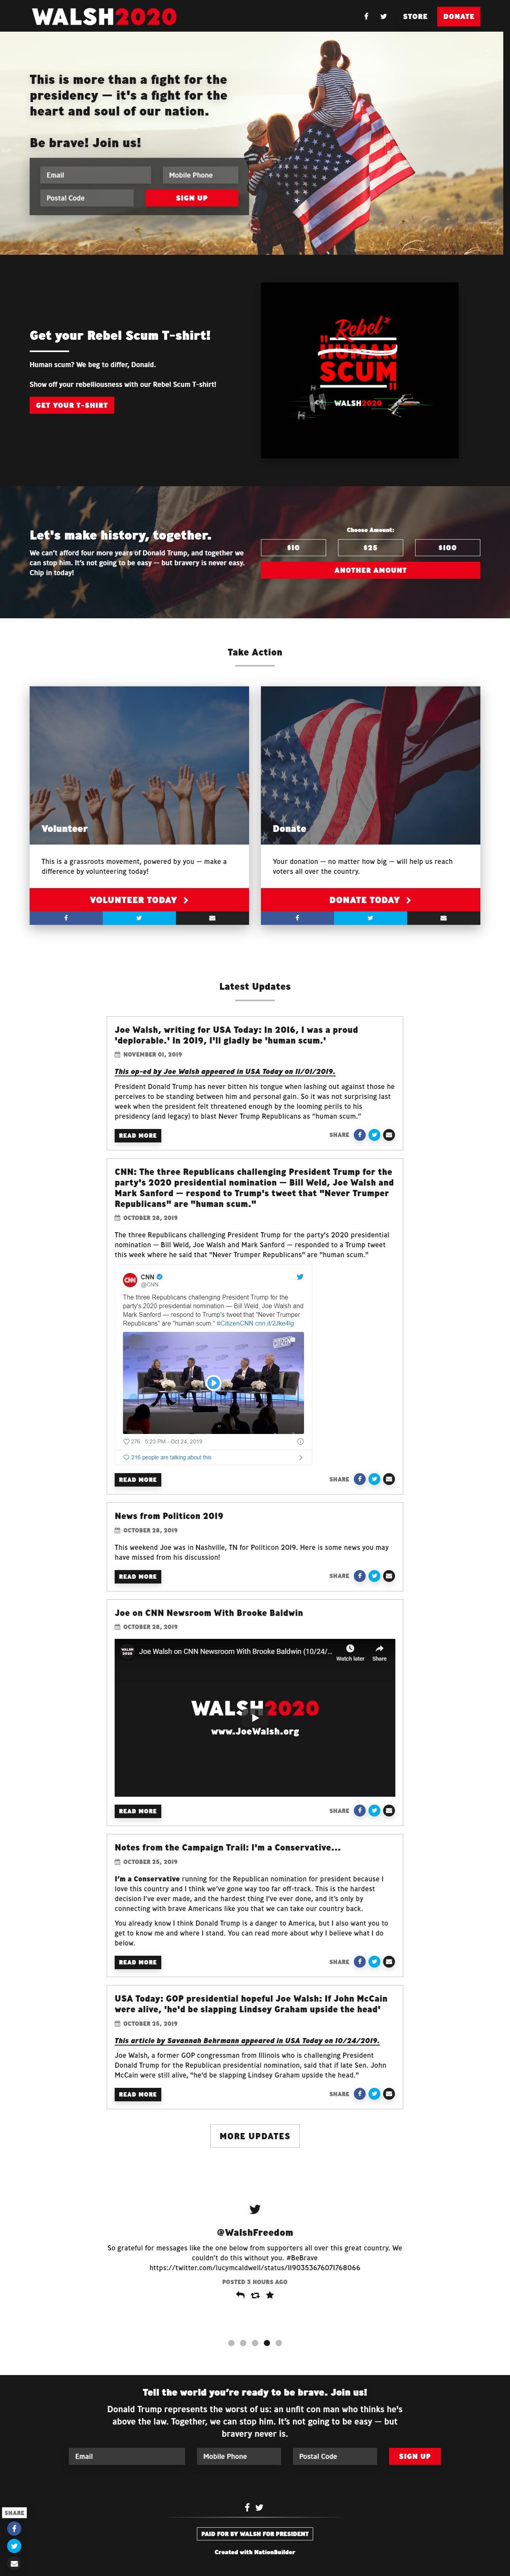 Homepage Snapshot for November 1, 2019: Former Representative Joe Walsh